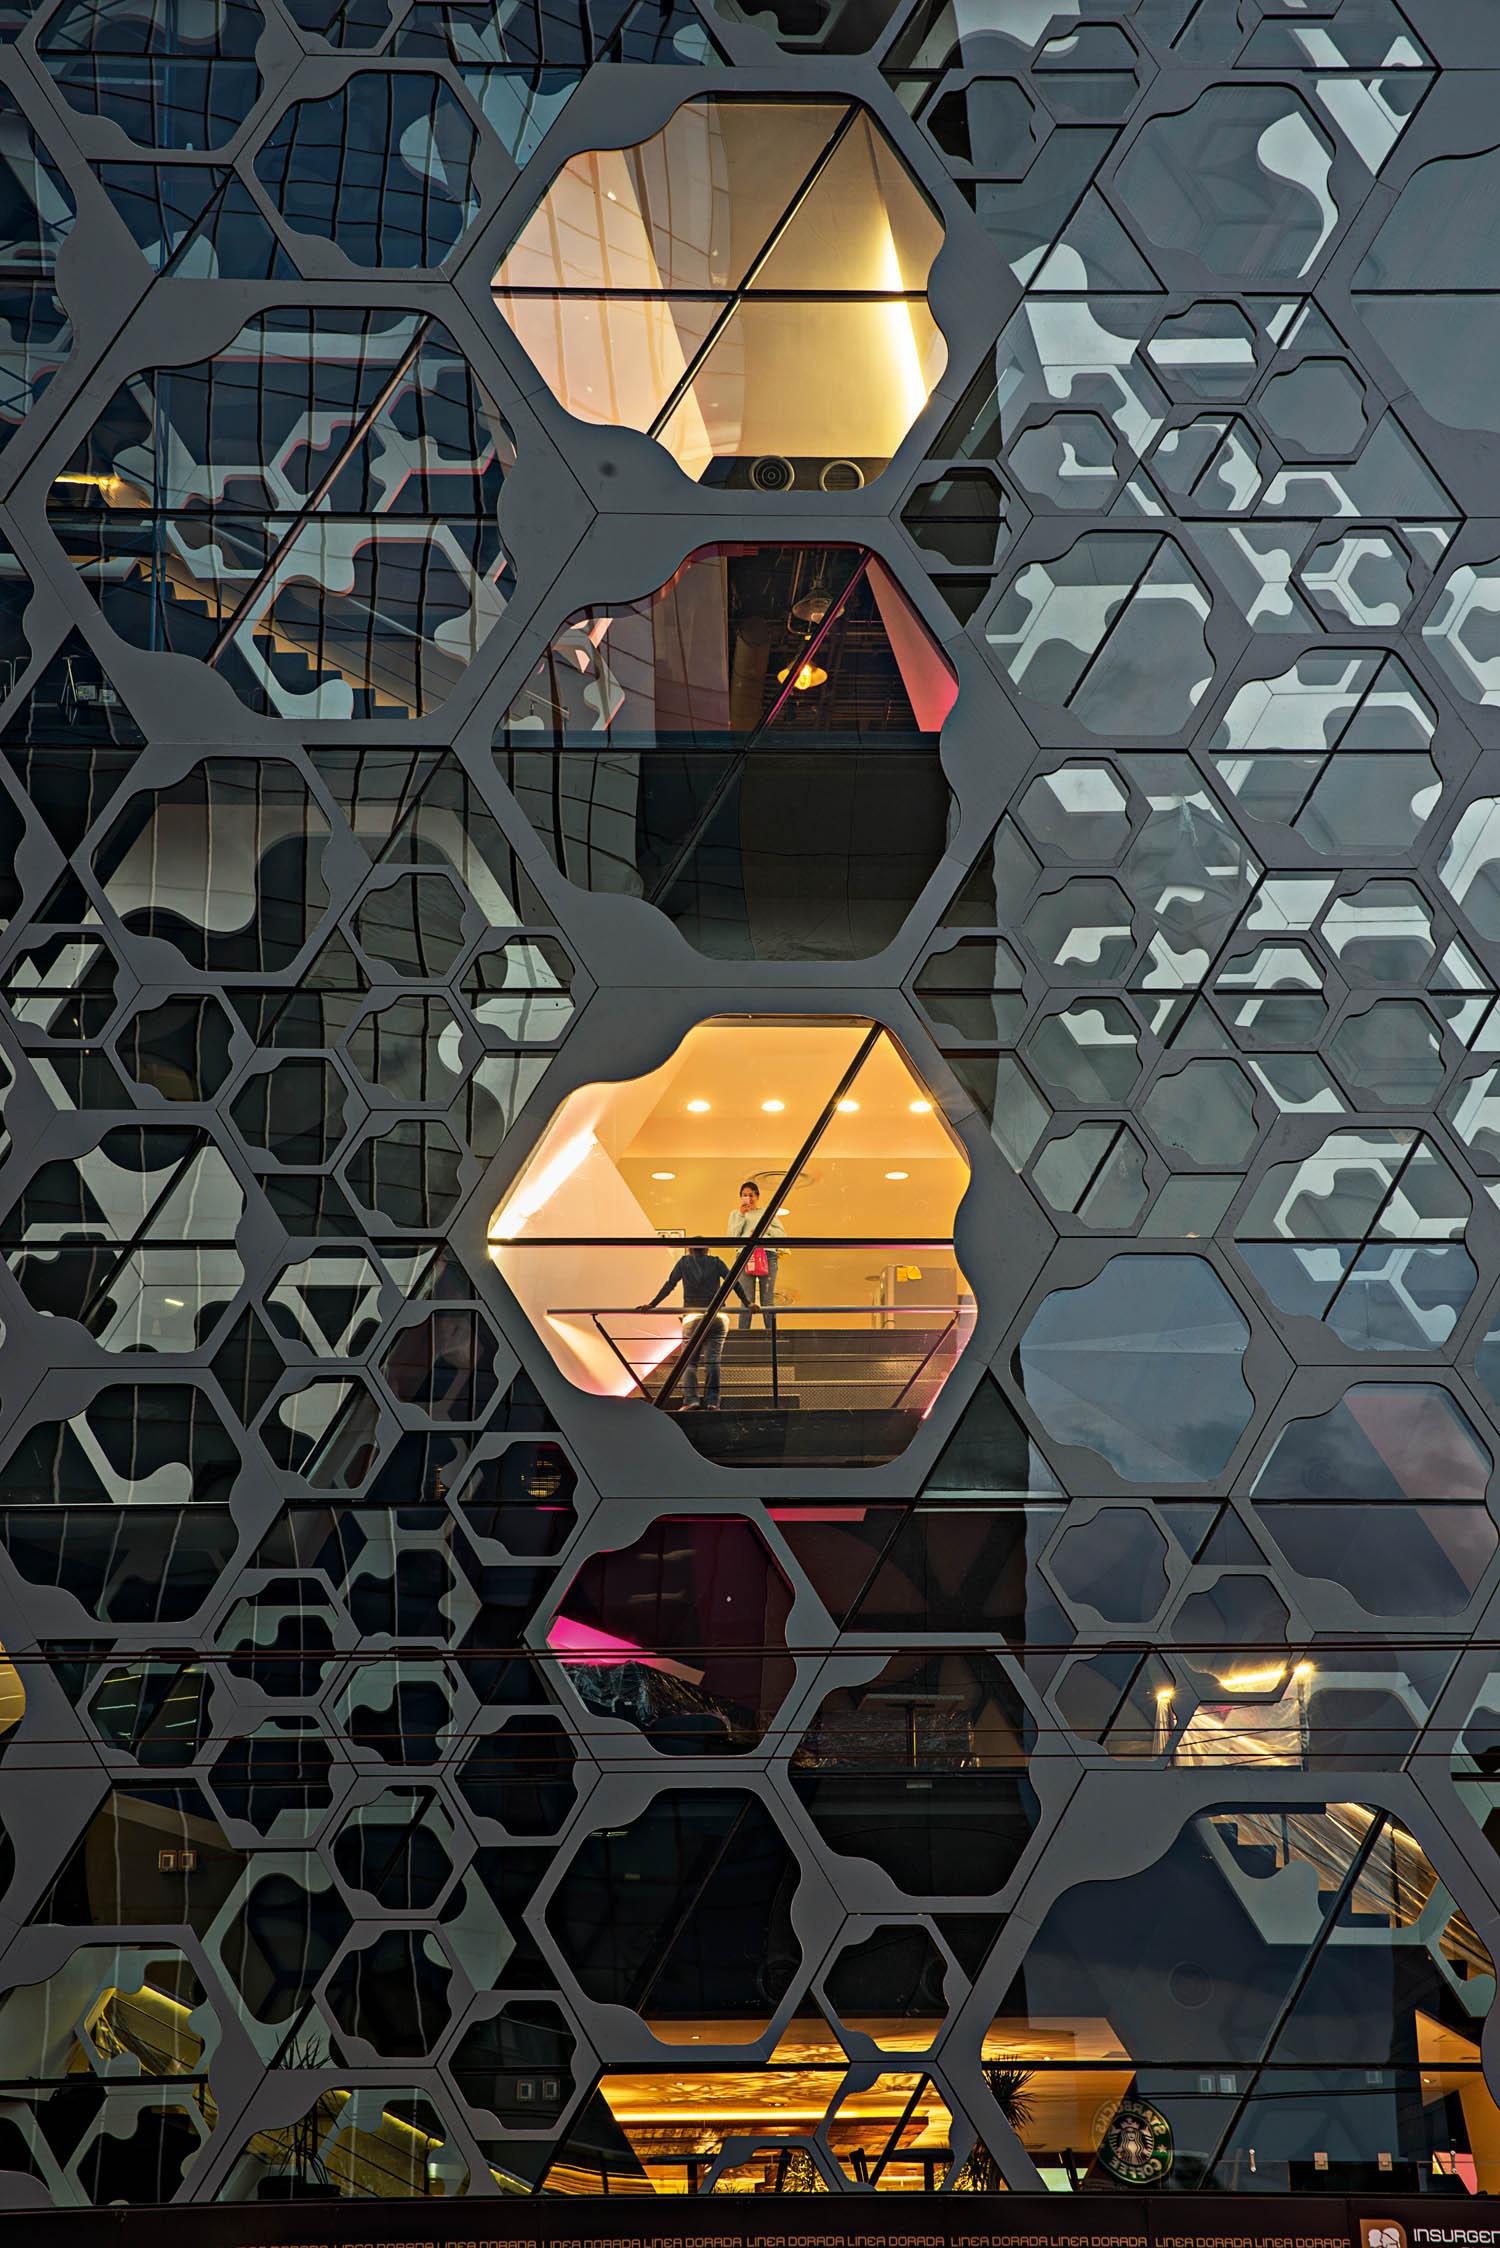 © Jaime Navarro immagini courtesy Rojkind Arquitectos Centro commerciale Liverpool InsurgentesCittà del Messico, Messico, 2014